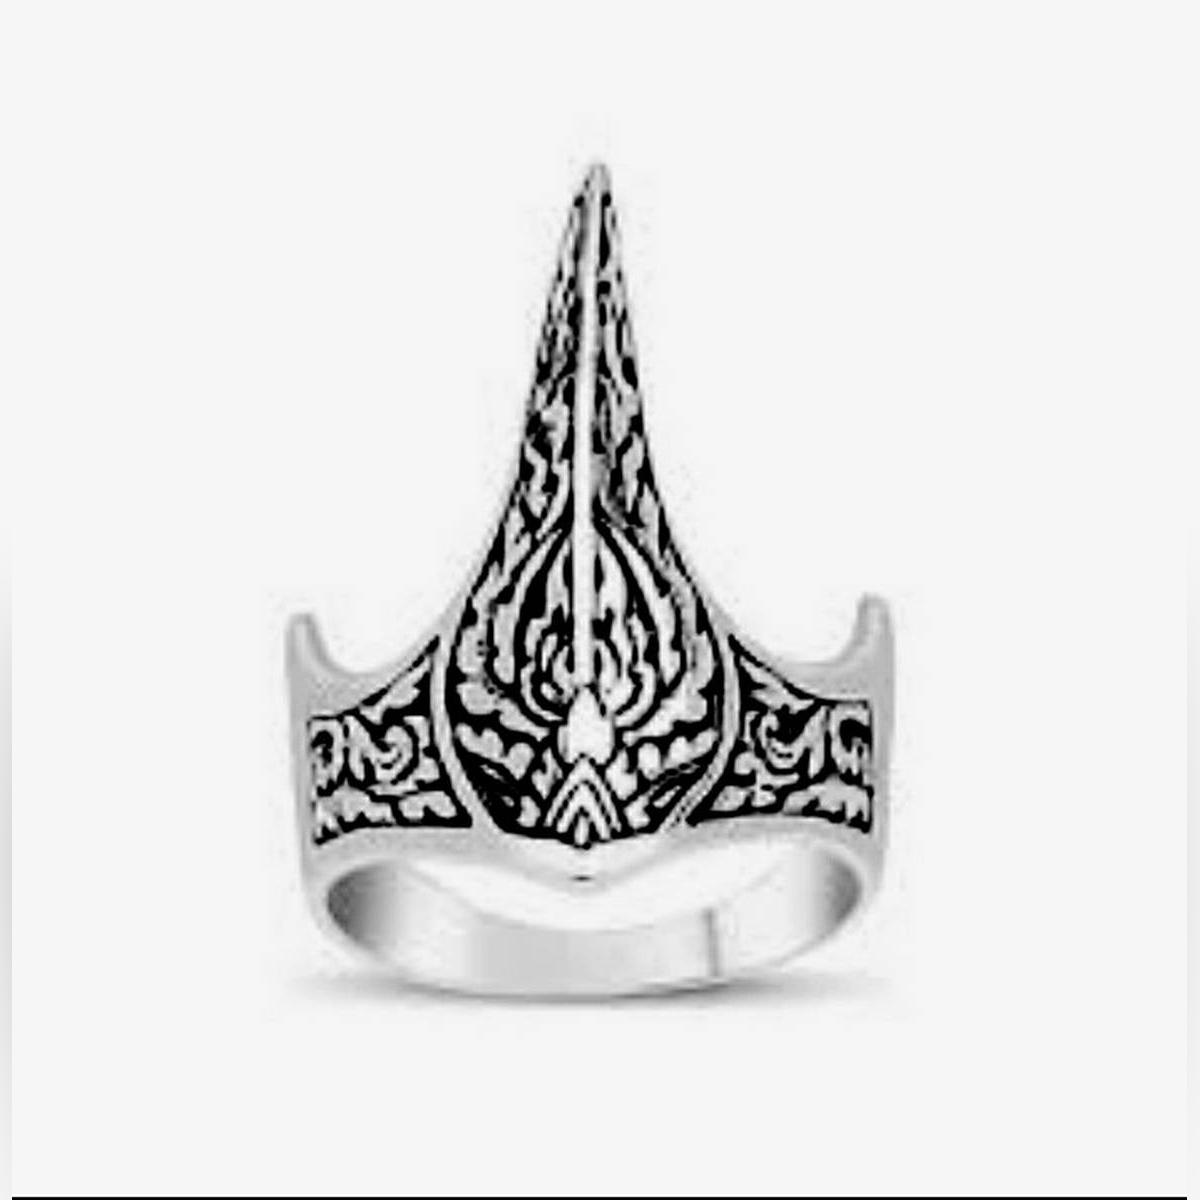 Ertugrul Kayi Tribe Ring Finger Ring(SMALL)